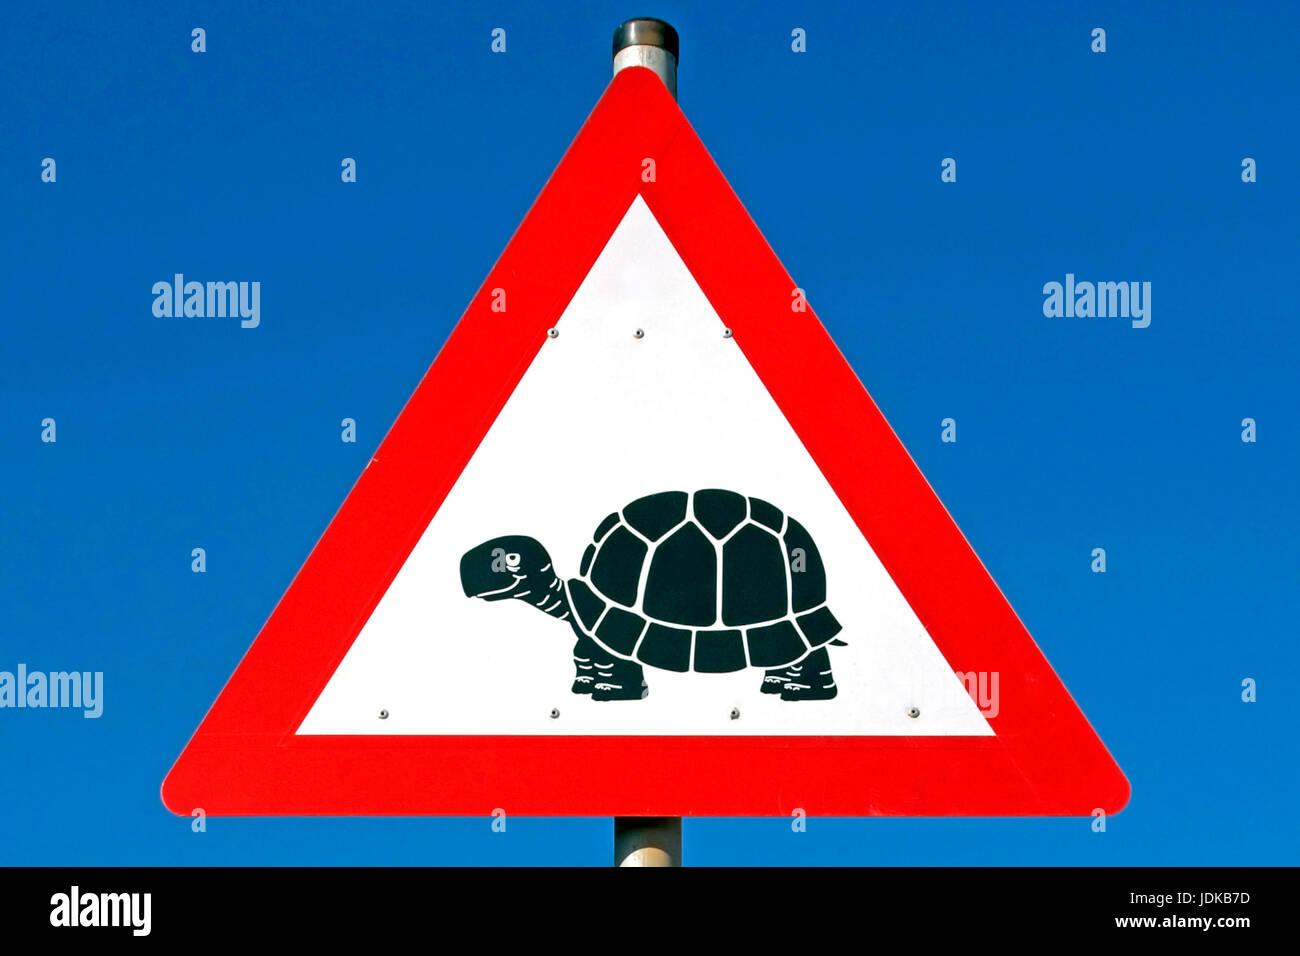 Road signs - esteem tortoises - Africa, Verkehrsschilder - Achtung Schildkroeten - Afrika Stock Photo